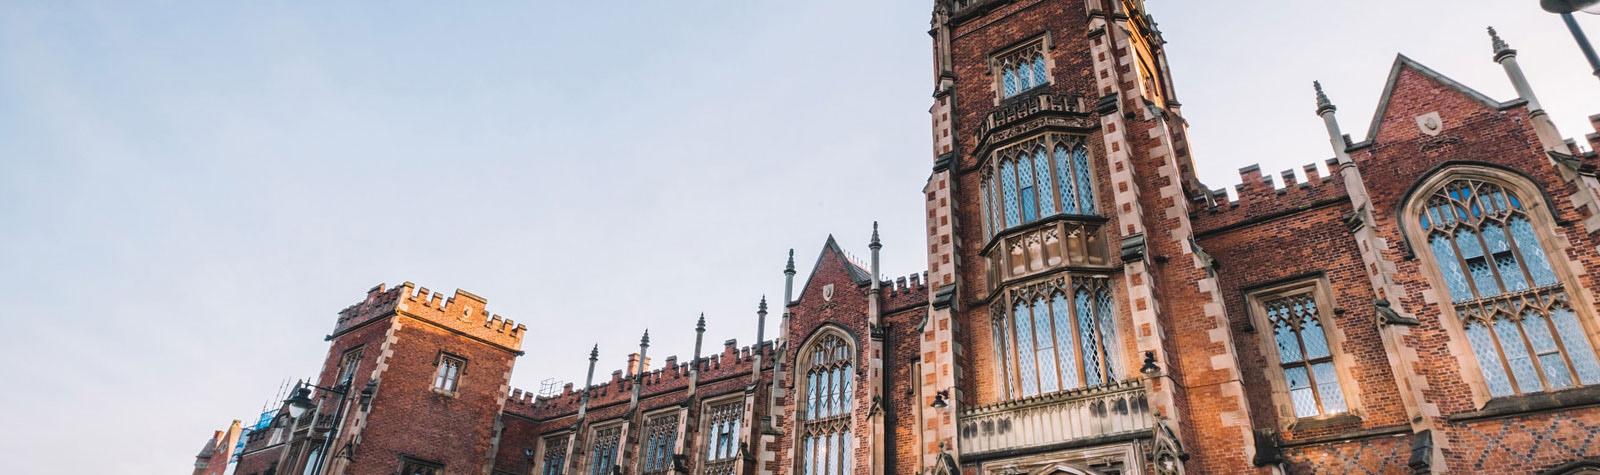 Queen  s University dating online domande di incontri appropriate